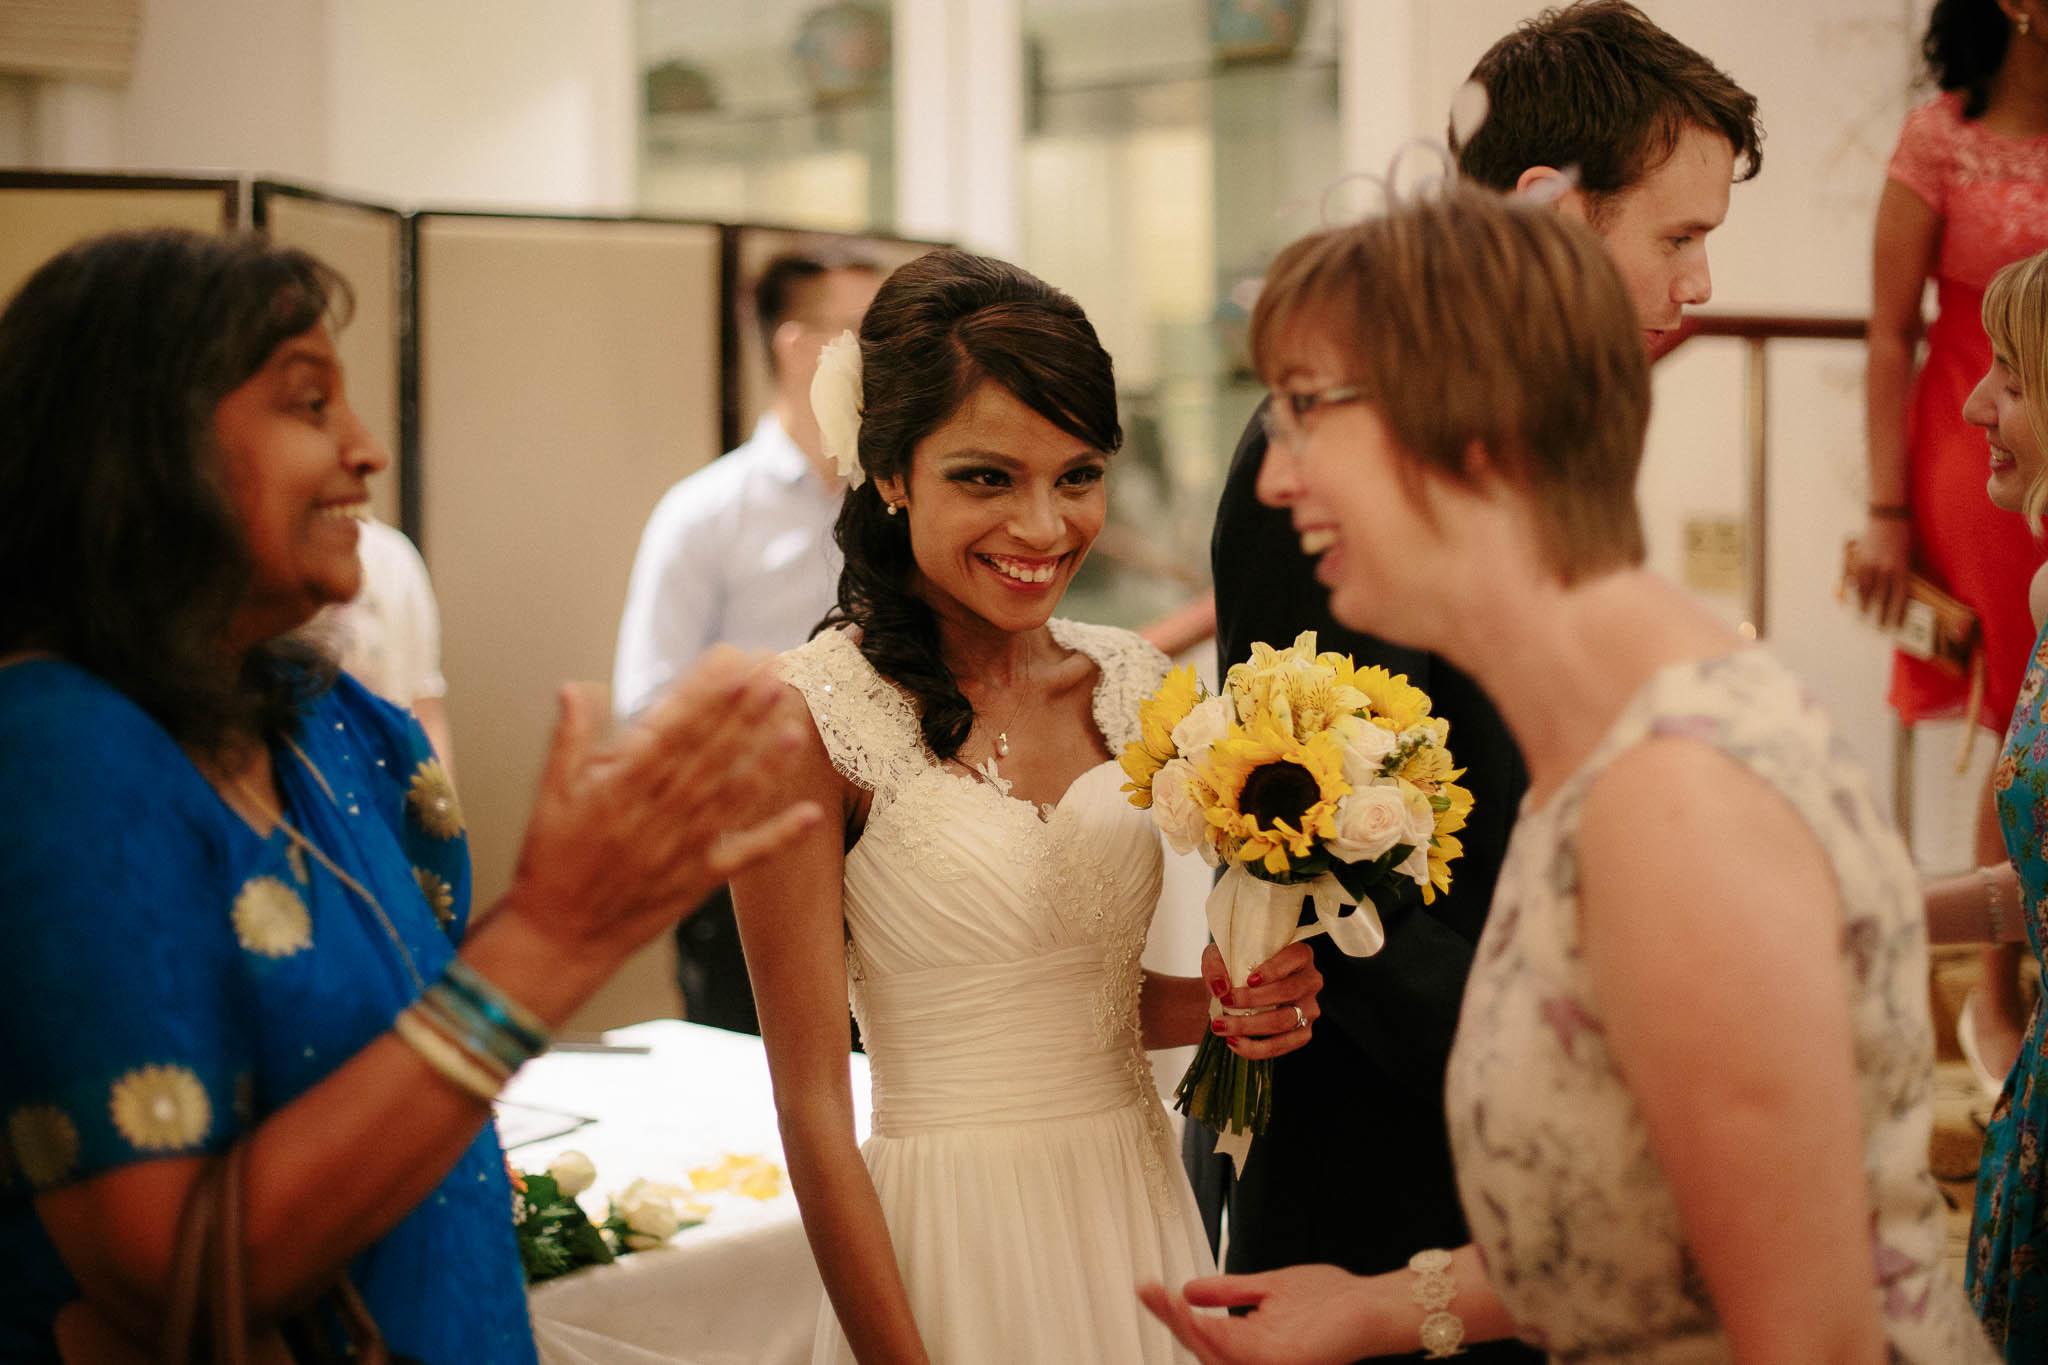 singapore-wedding-photographer-st-andrews-cathedral-renita-david-59.jpg